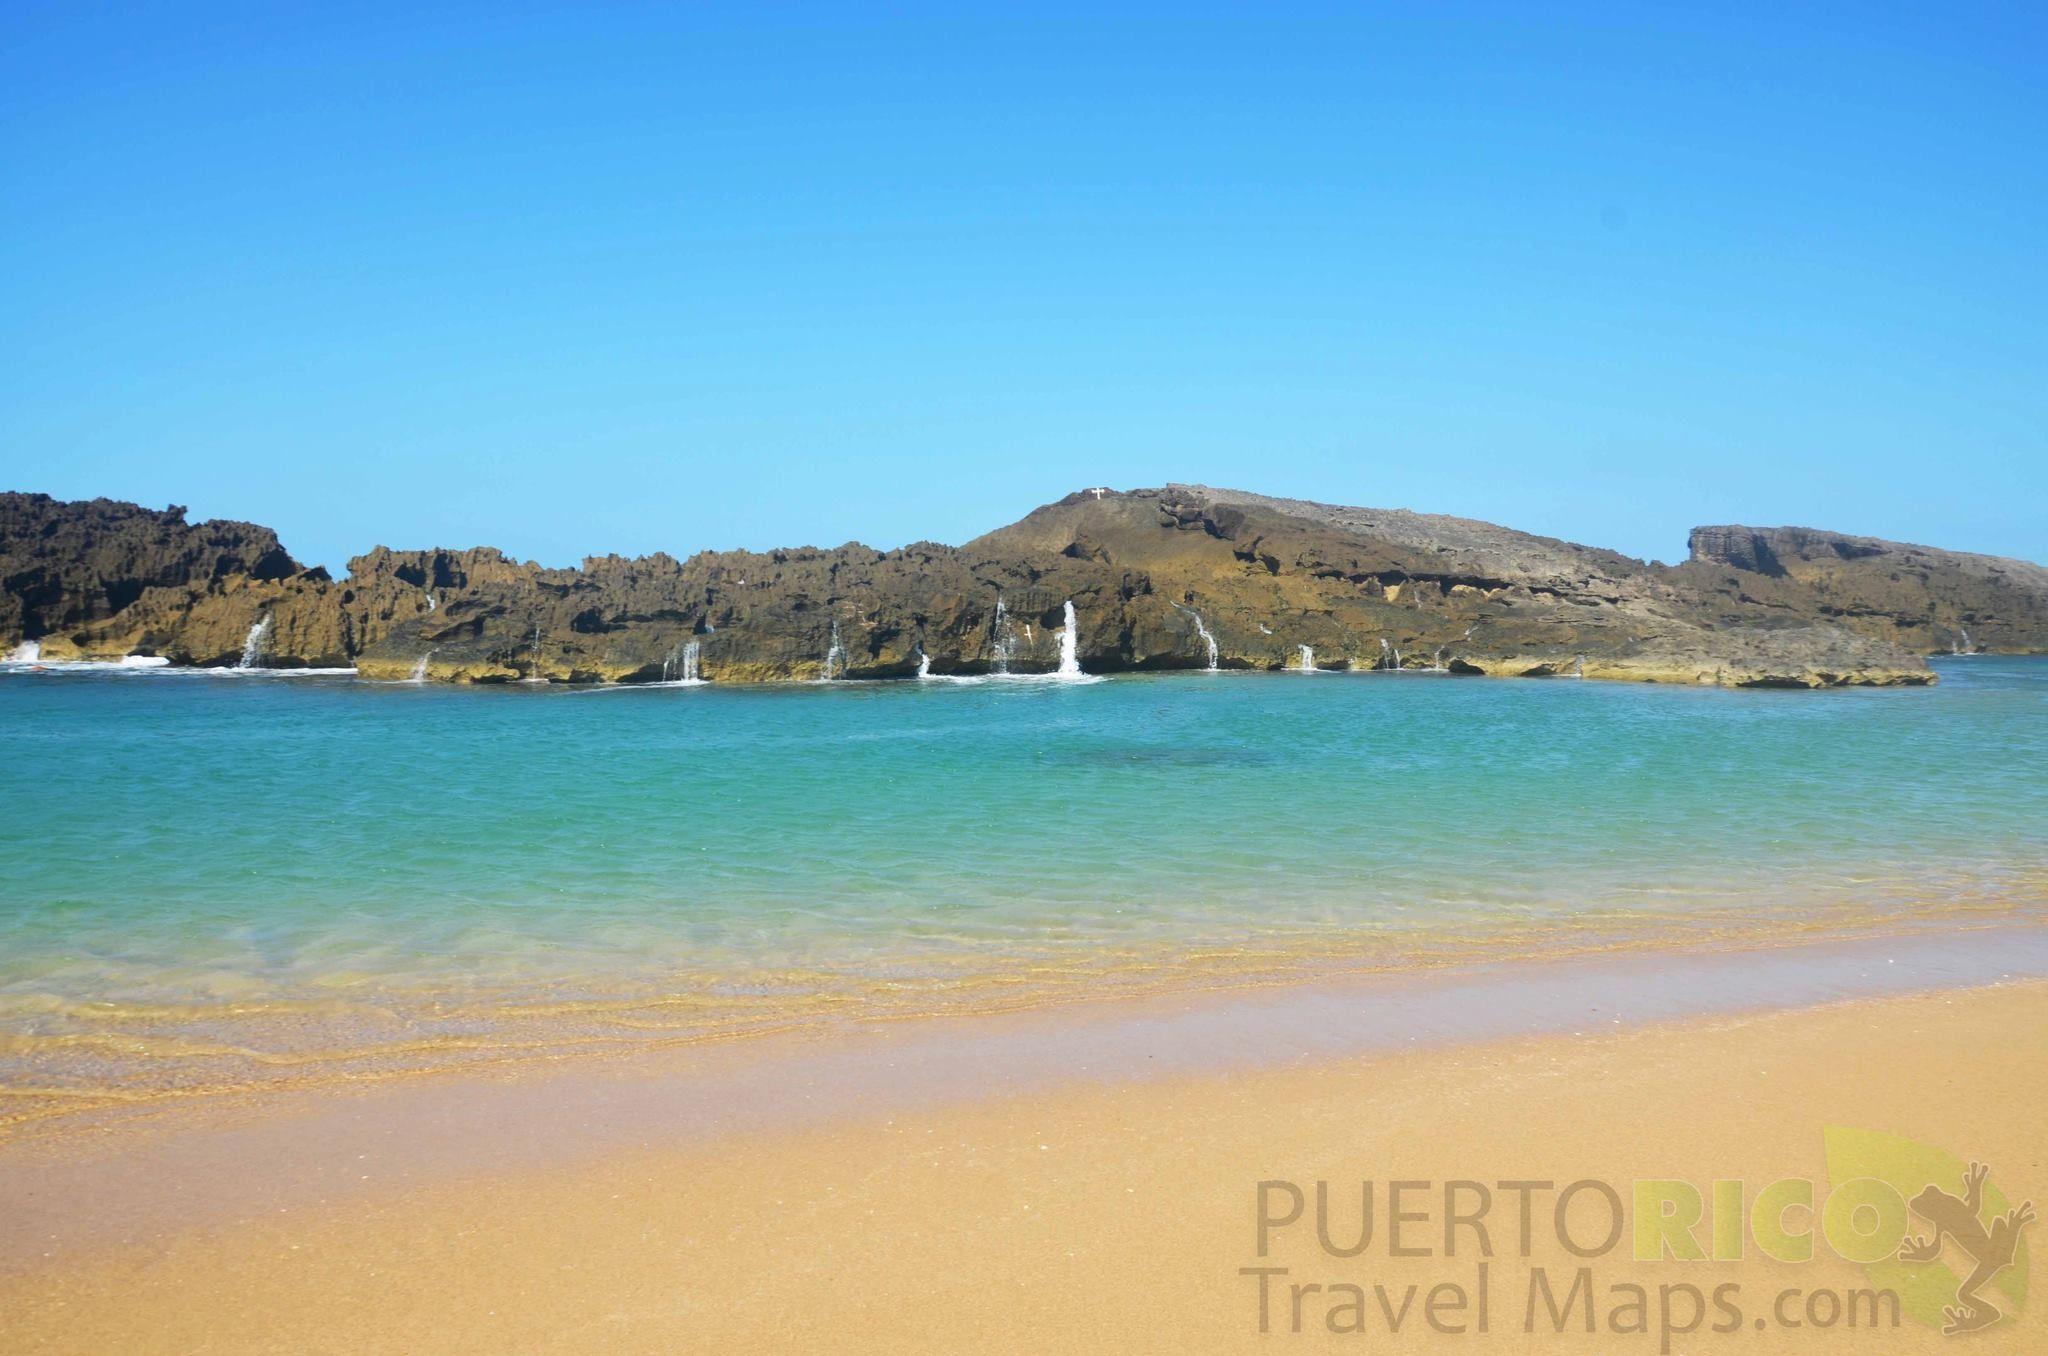 Playa Puerto Nuevo Vega Baja Rico